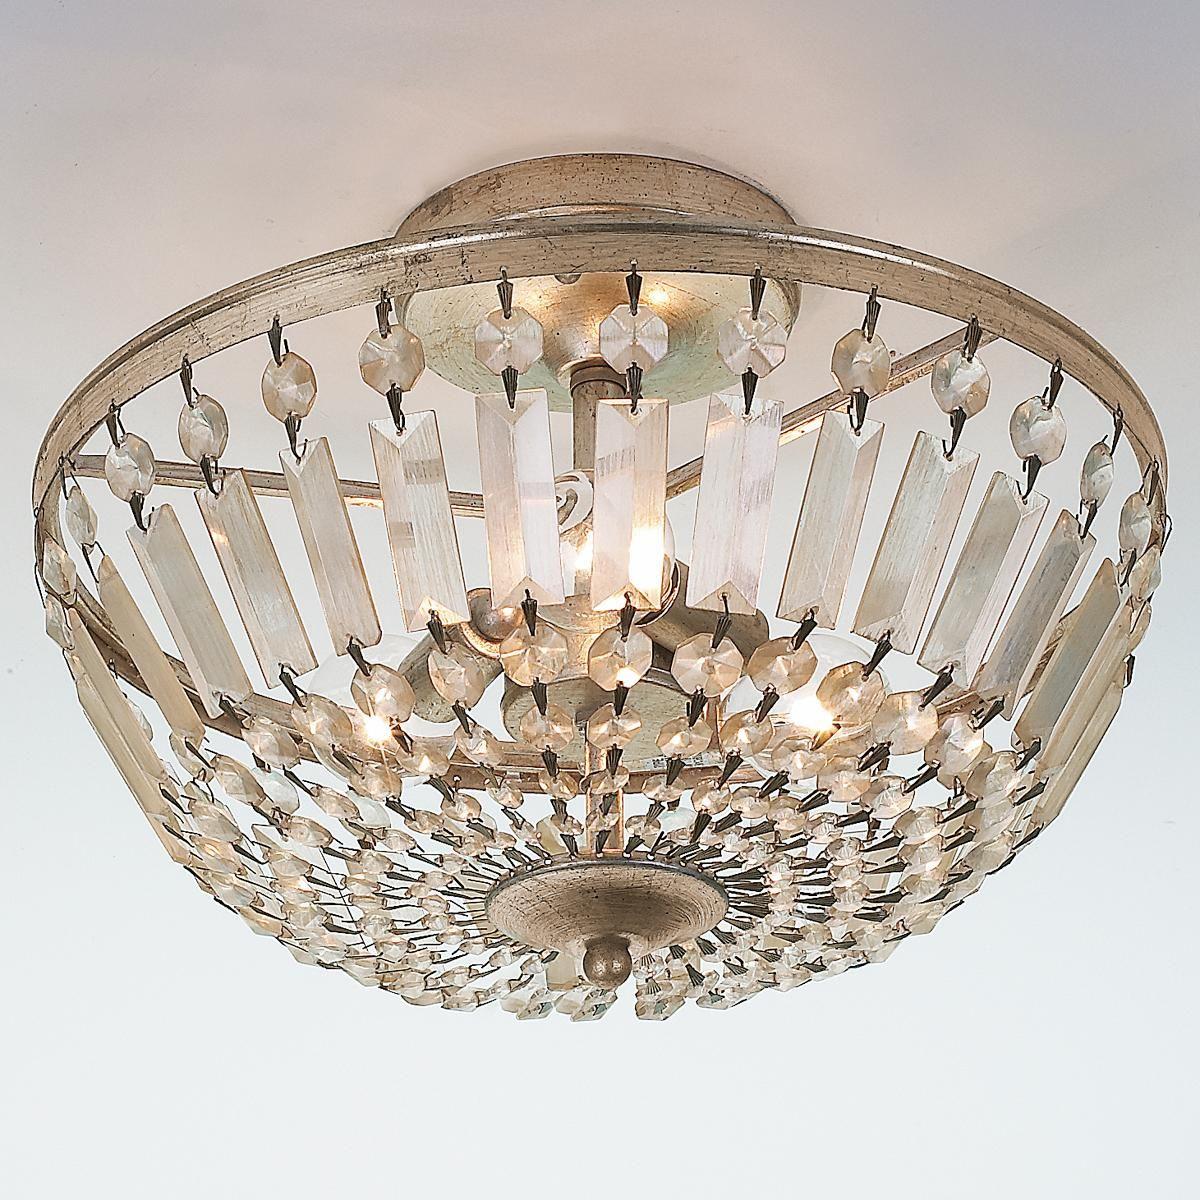 Naples Antiqued Crystal Basket Semi Flush Ceiling Light Ceiling Lights Semi Flush Ceiling Lights Ceiling Light Shades